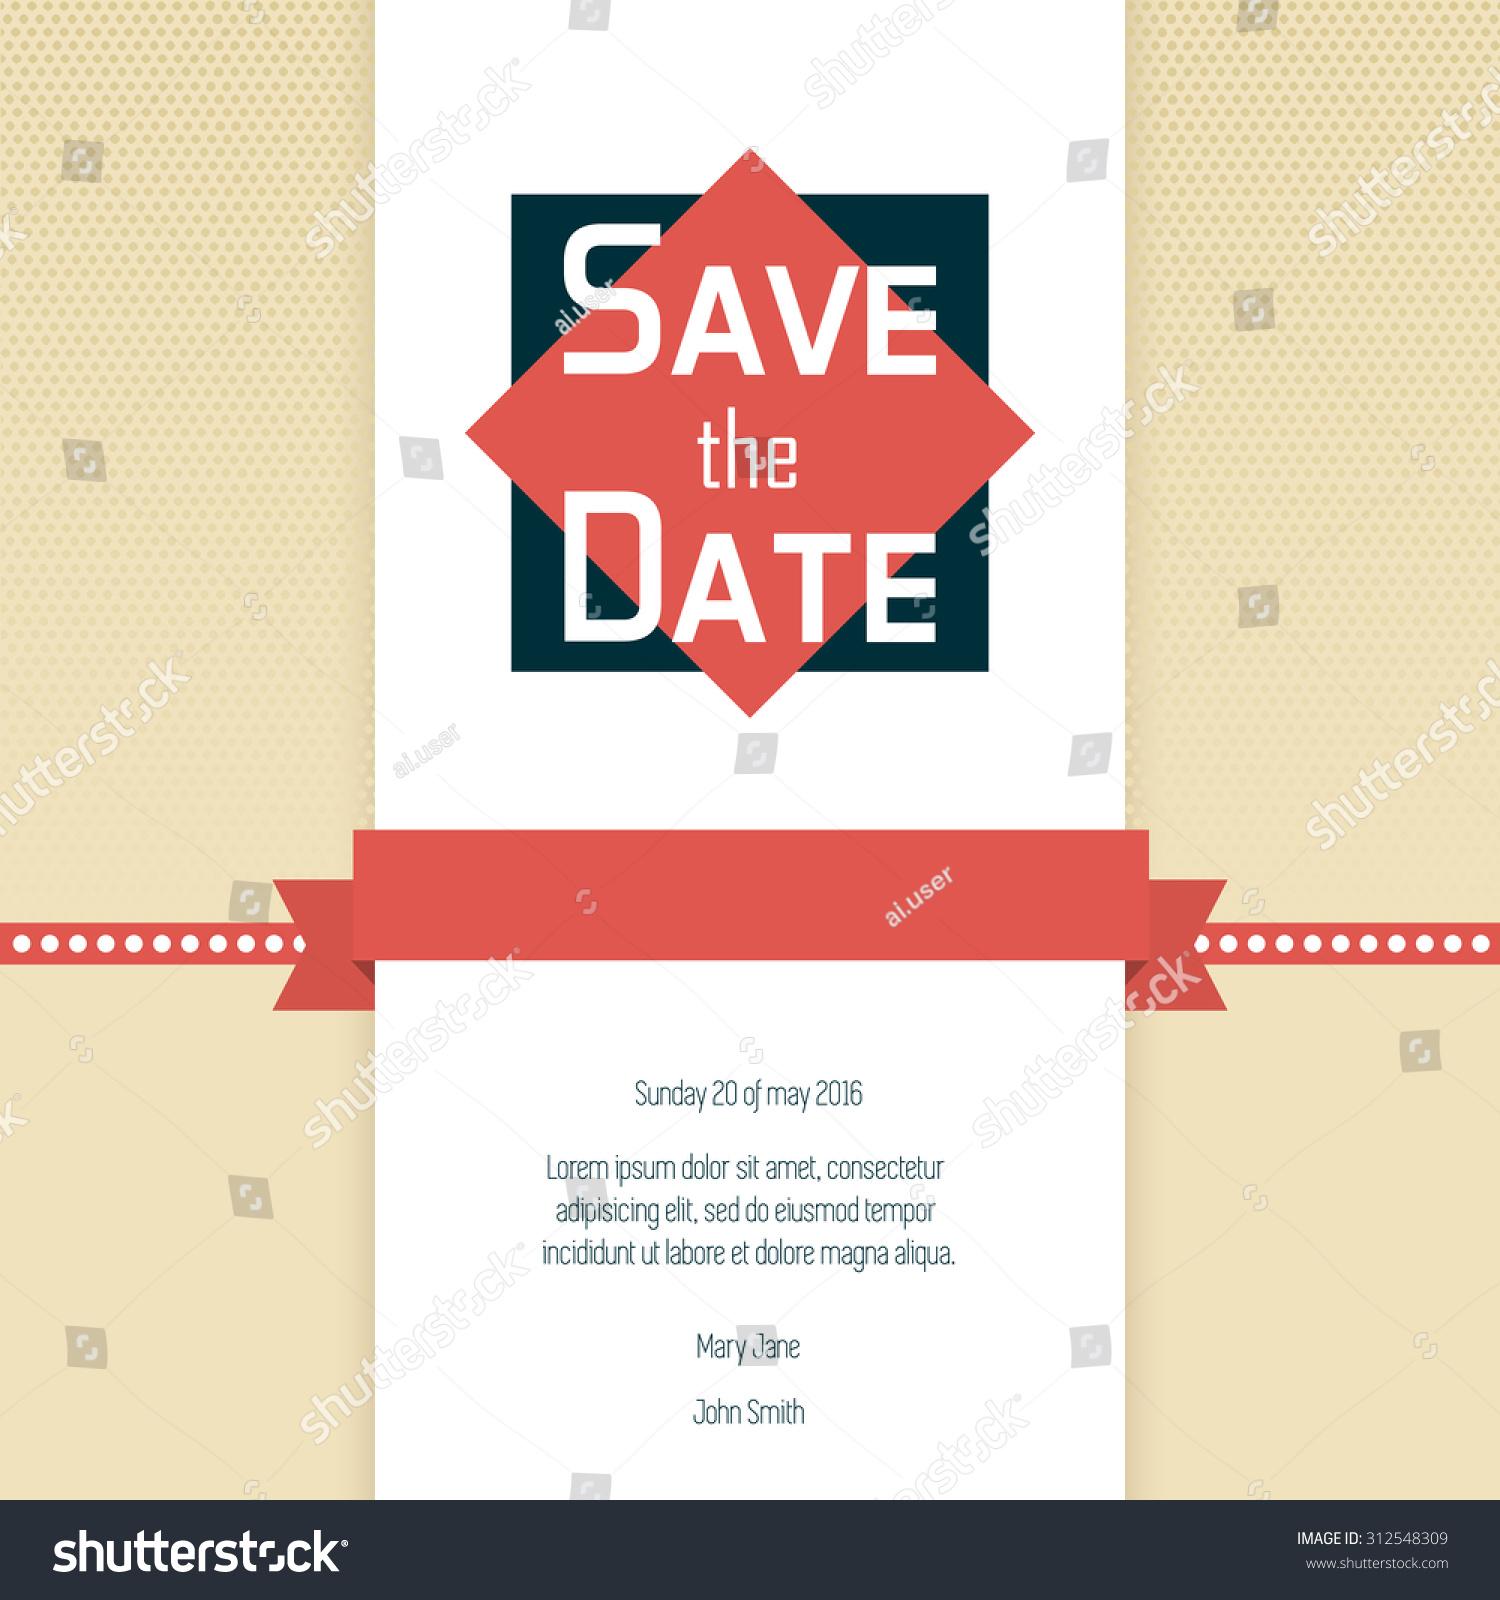 Save Date Wedding Invitation Template Stock Vector 312548309 ...